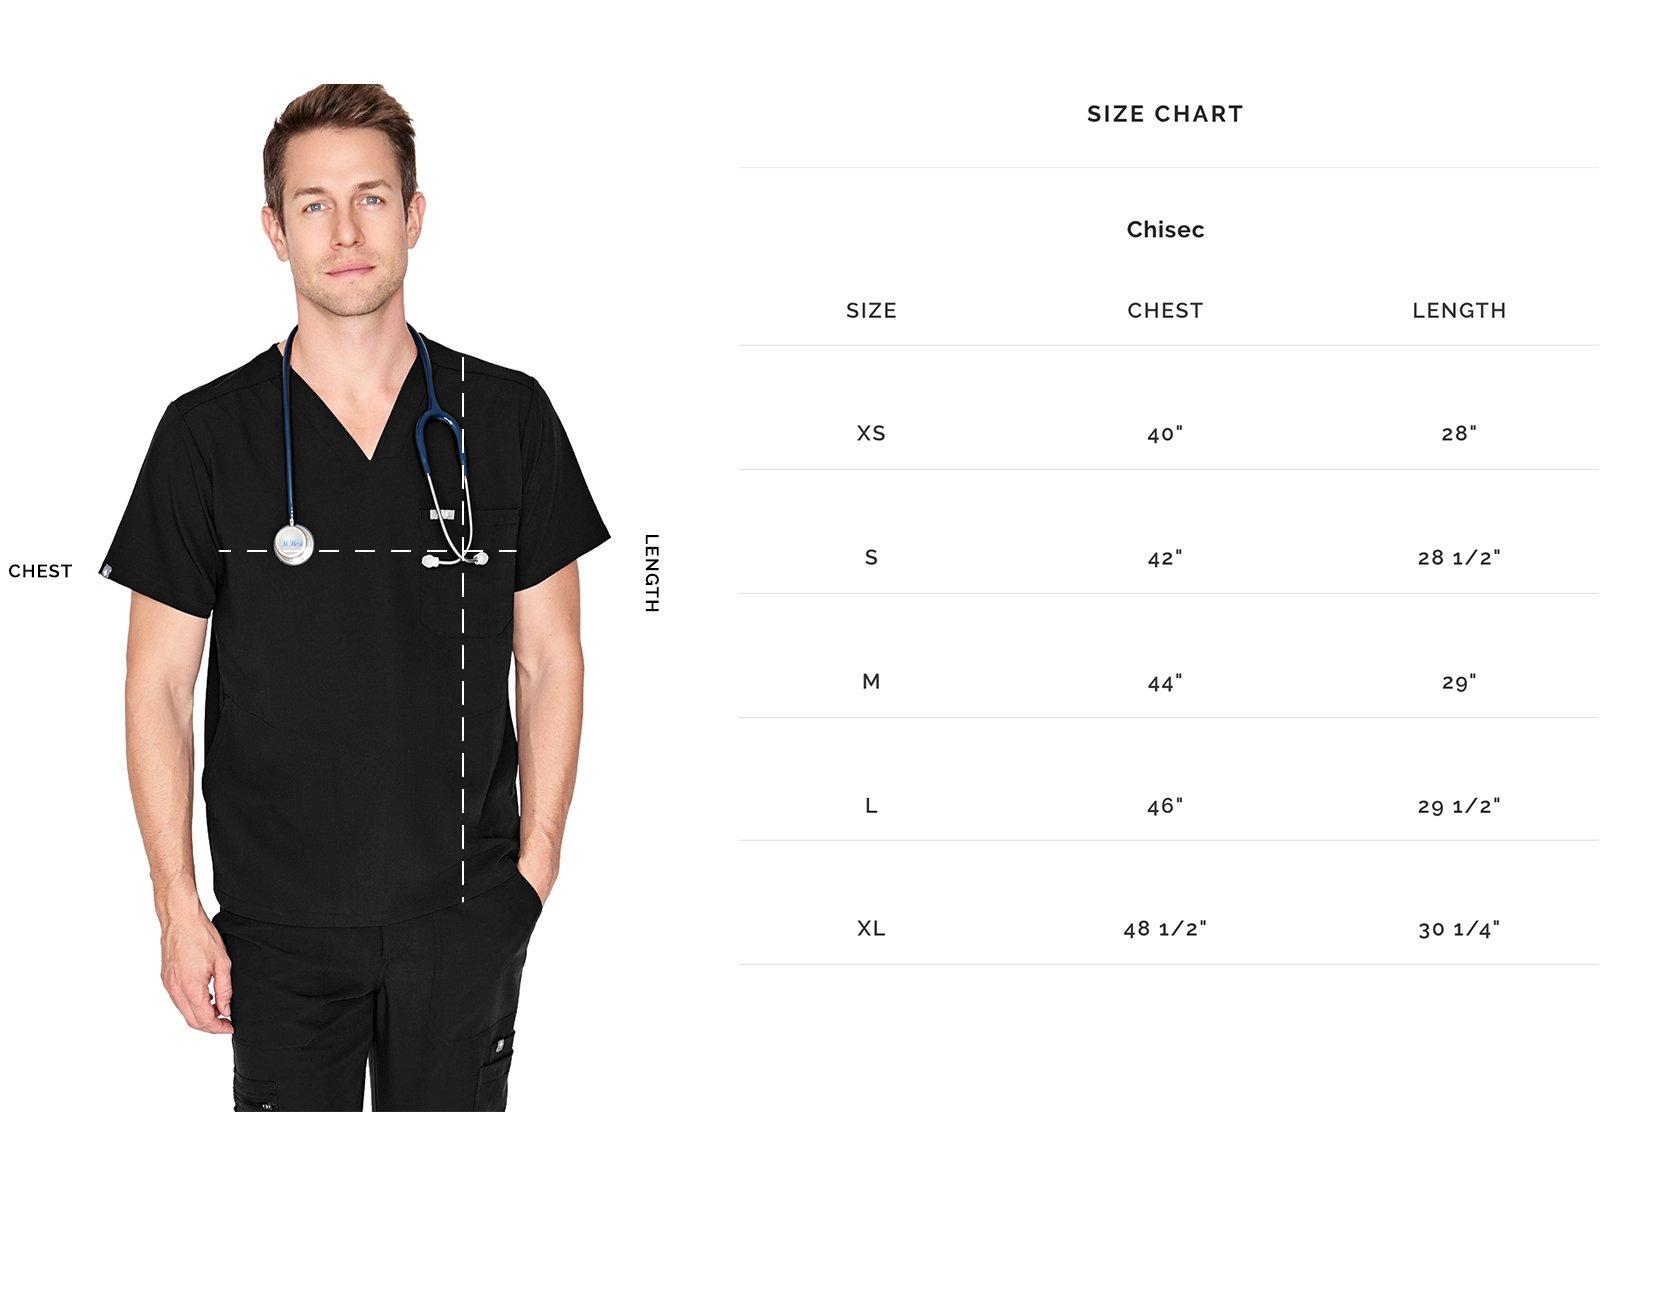 FIGS Medical Scrubs Men's Chisec Three Pocket Top (Black, XS) by FIGS (Image #7)